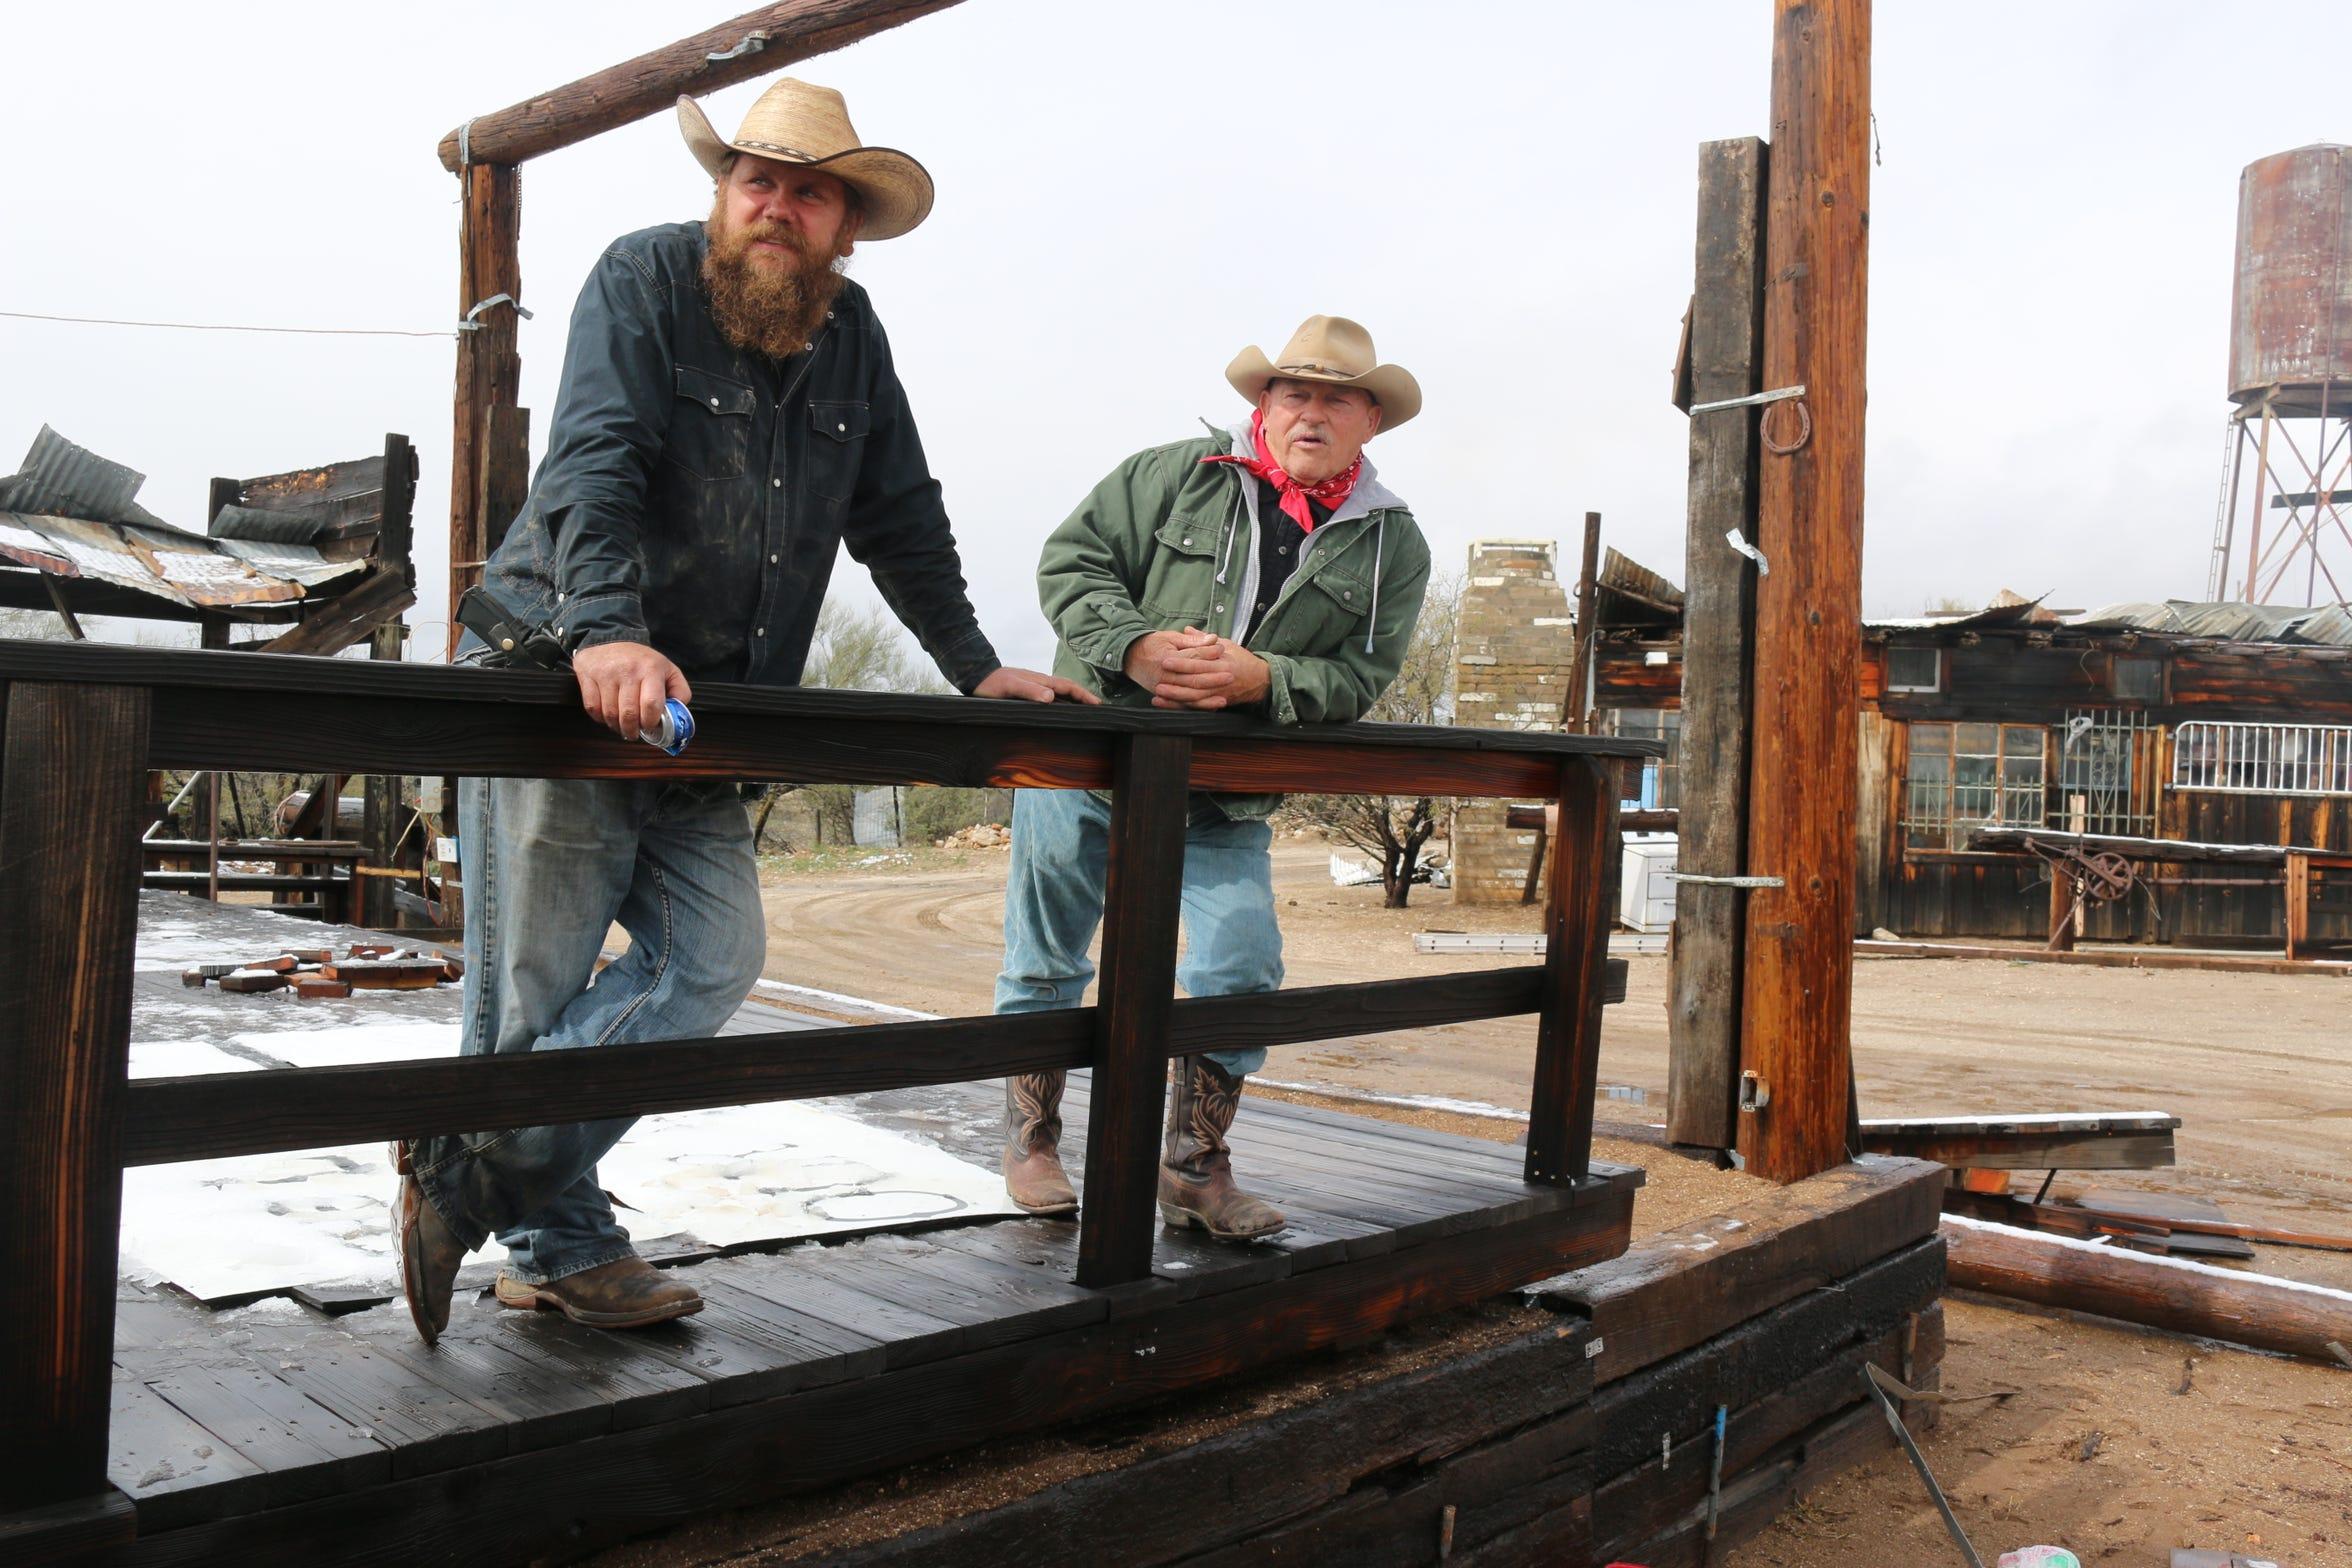 Dan Clark (left) and Larry Burt talk at Cowtown Keeylocko.